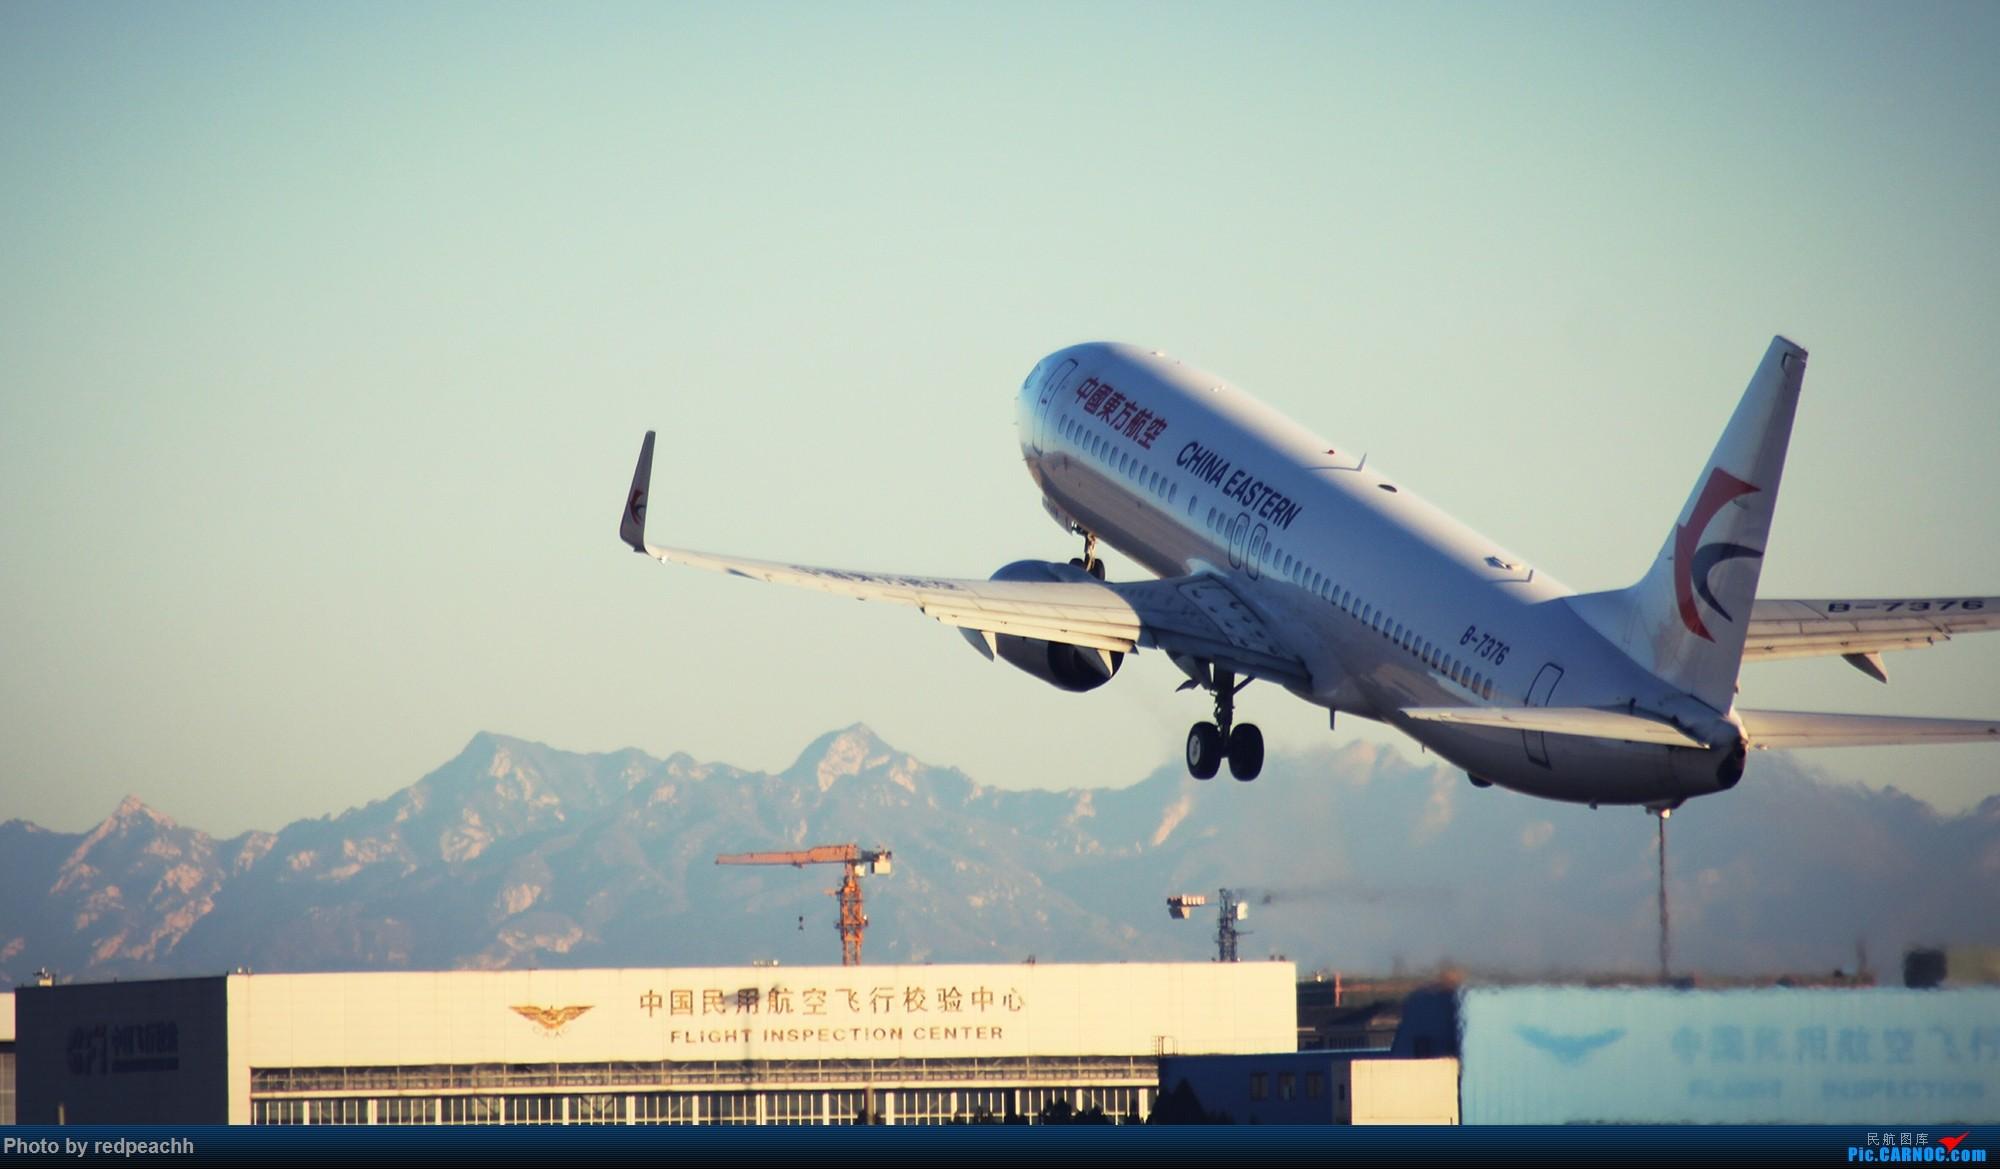 Re:[原创]河北人为拍机而首都机场2日游虽常规但值得纪念(36L) BOEING 737-800 B-7376 中国北京首都国际机场